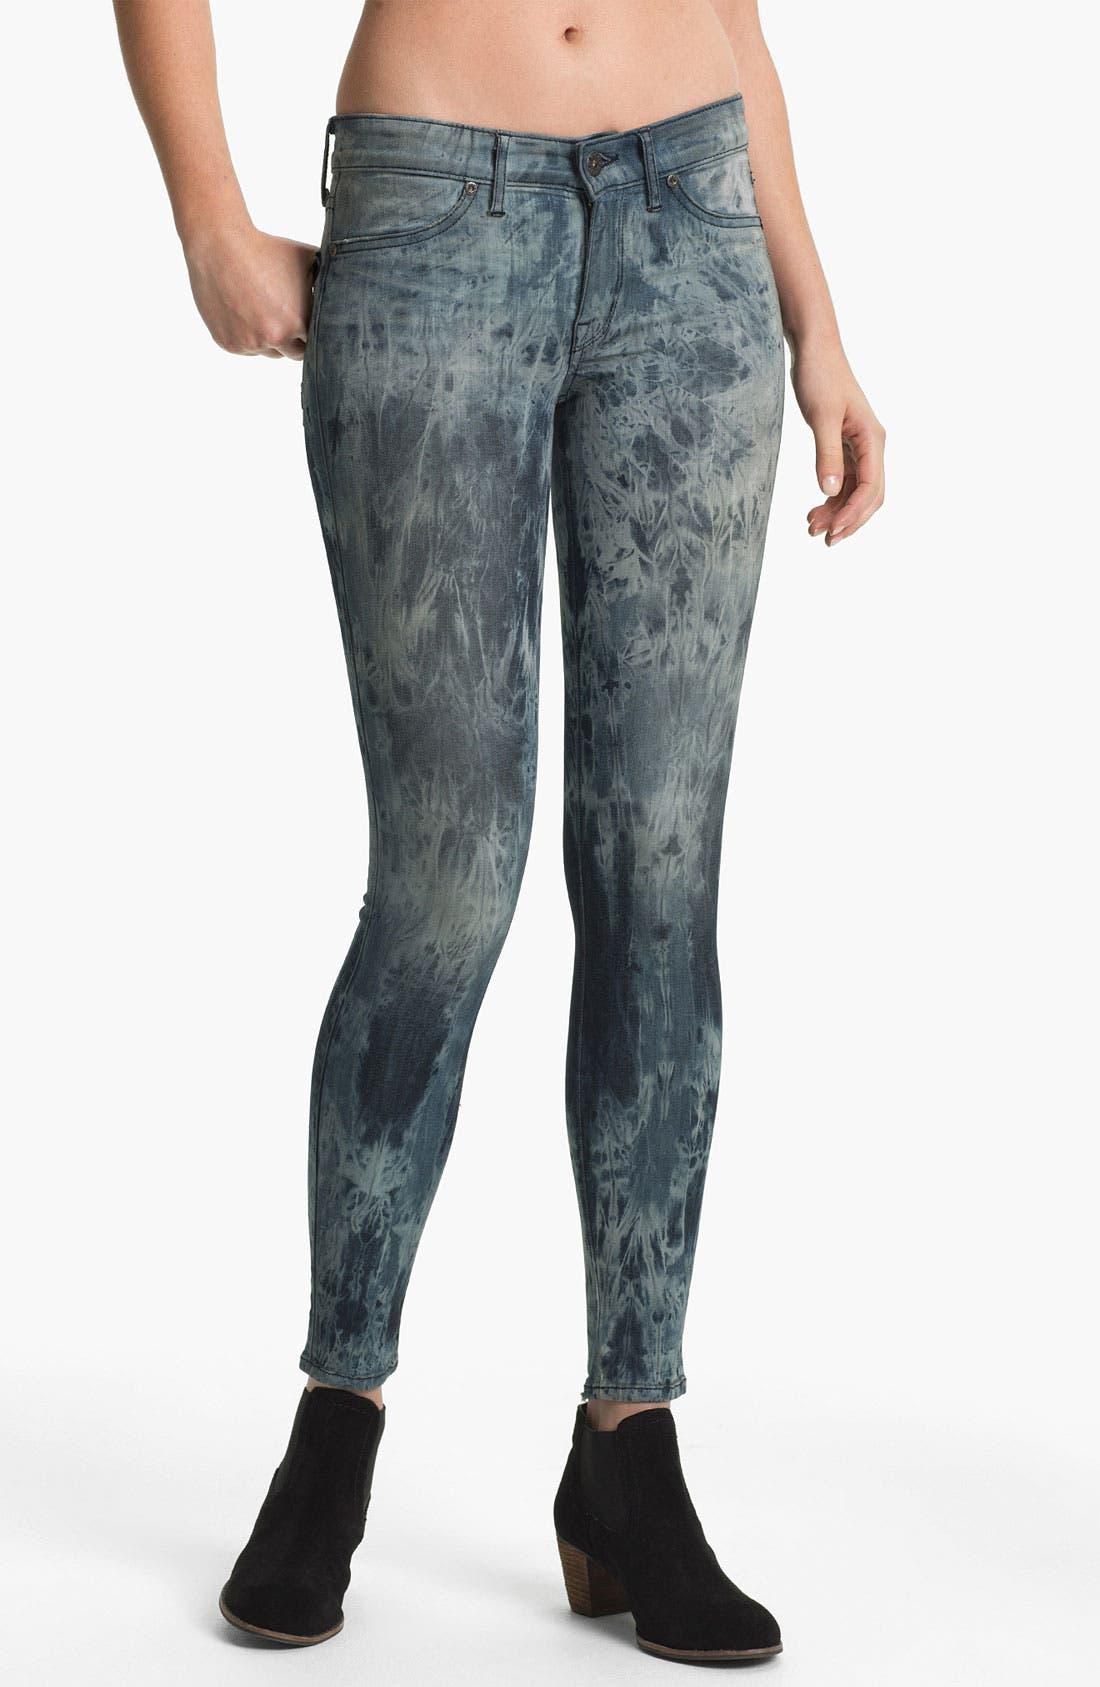 Main Image - Rich & Skinny 'Legacy' Skinny Jeans (Dead Beat)